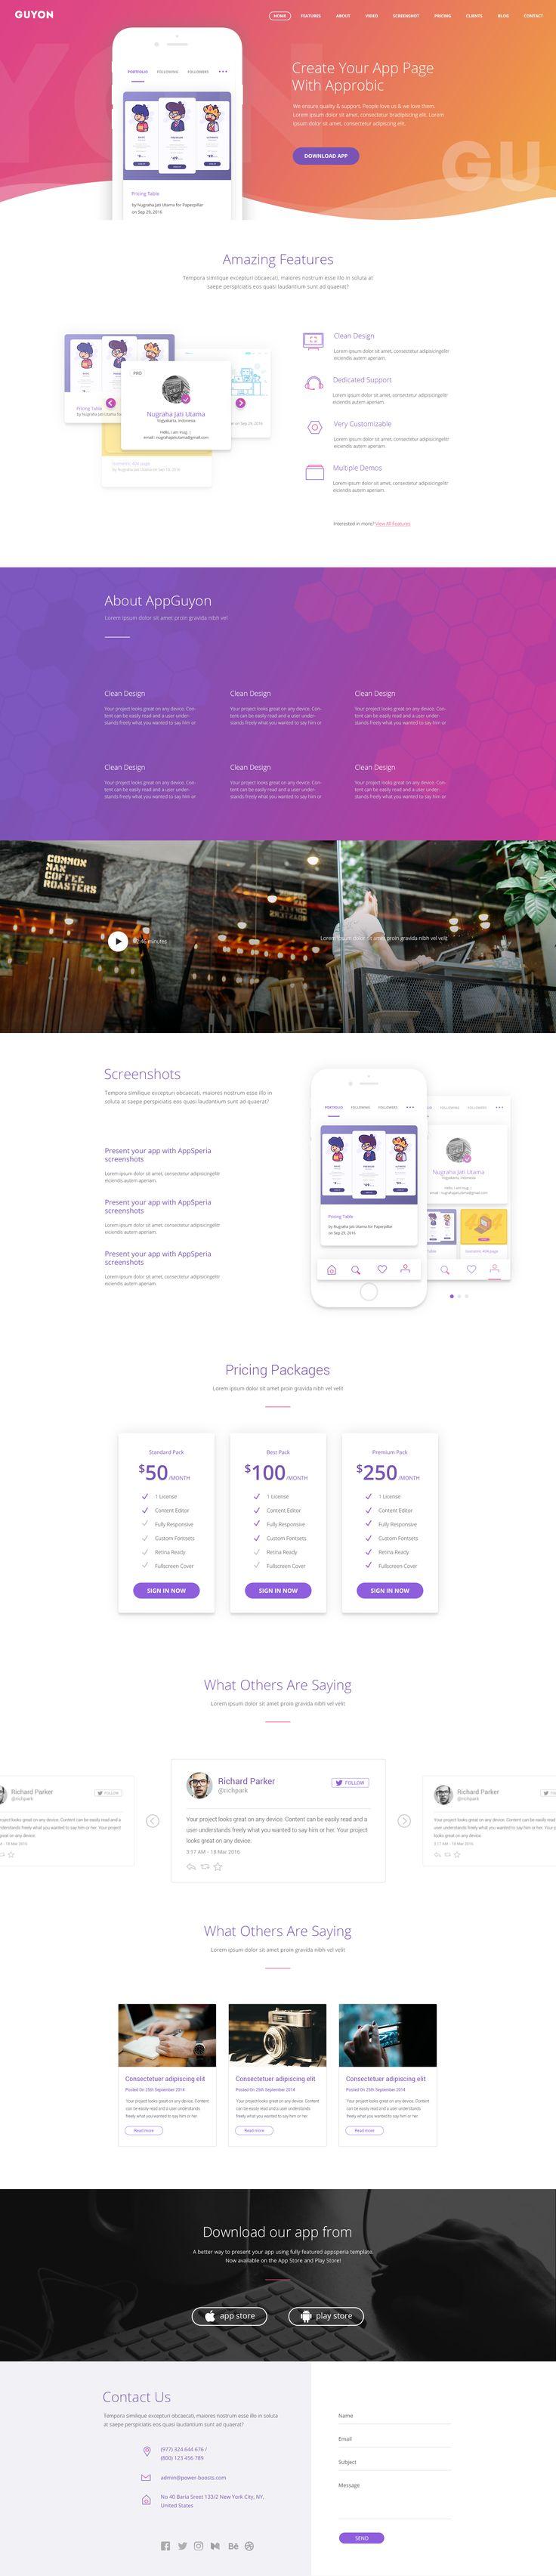 393 best images about epic web design on pinterest | behance